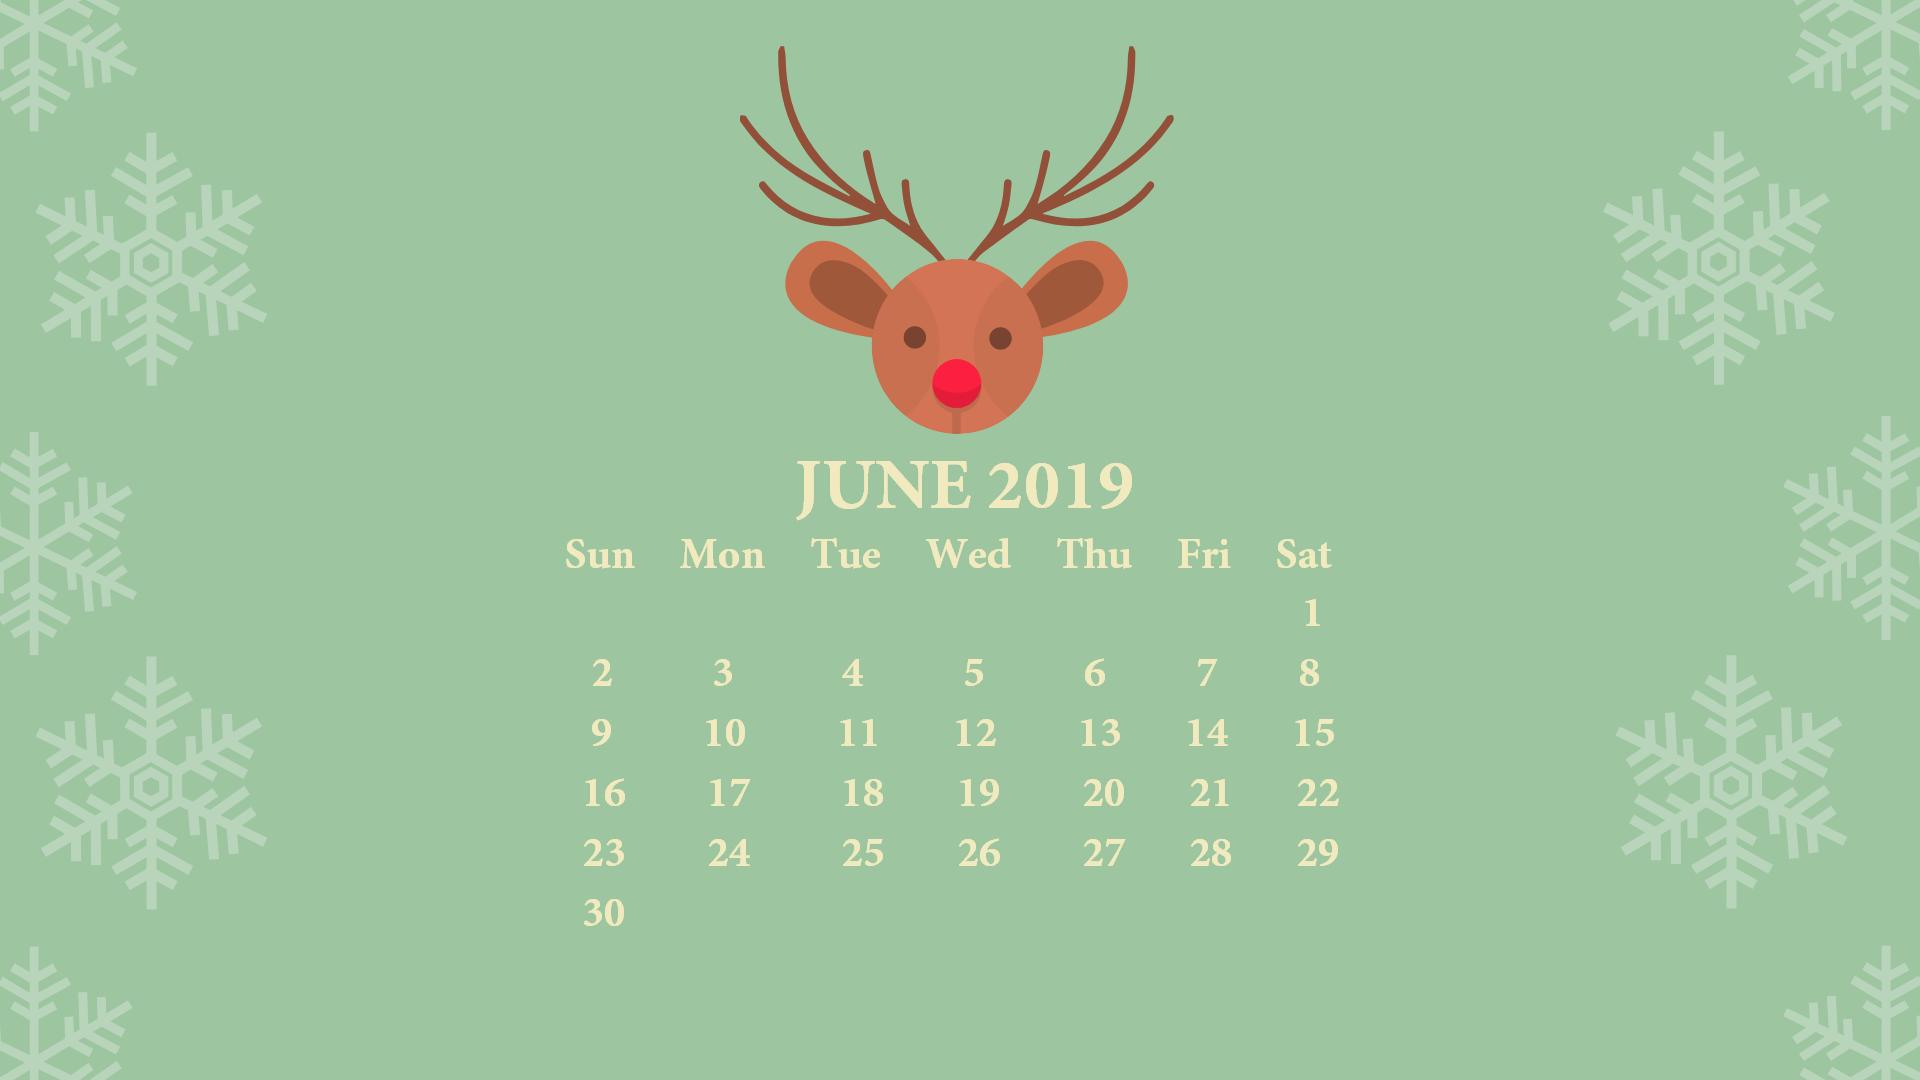 June 2019 Desktop Calendar with Wallpaper